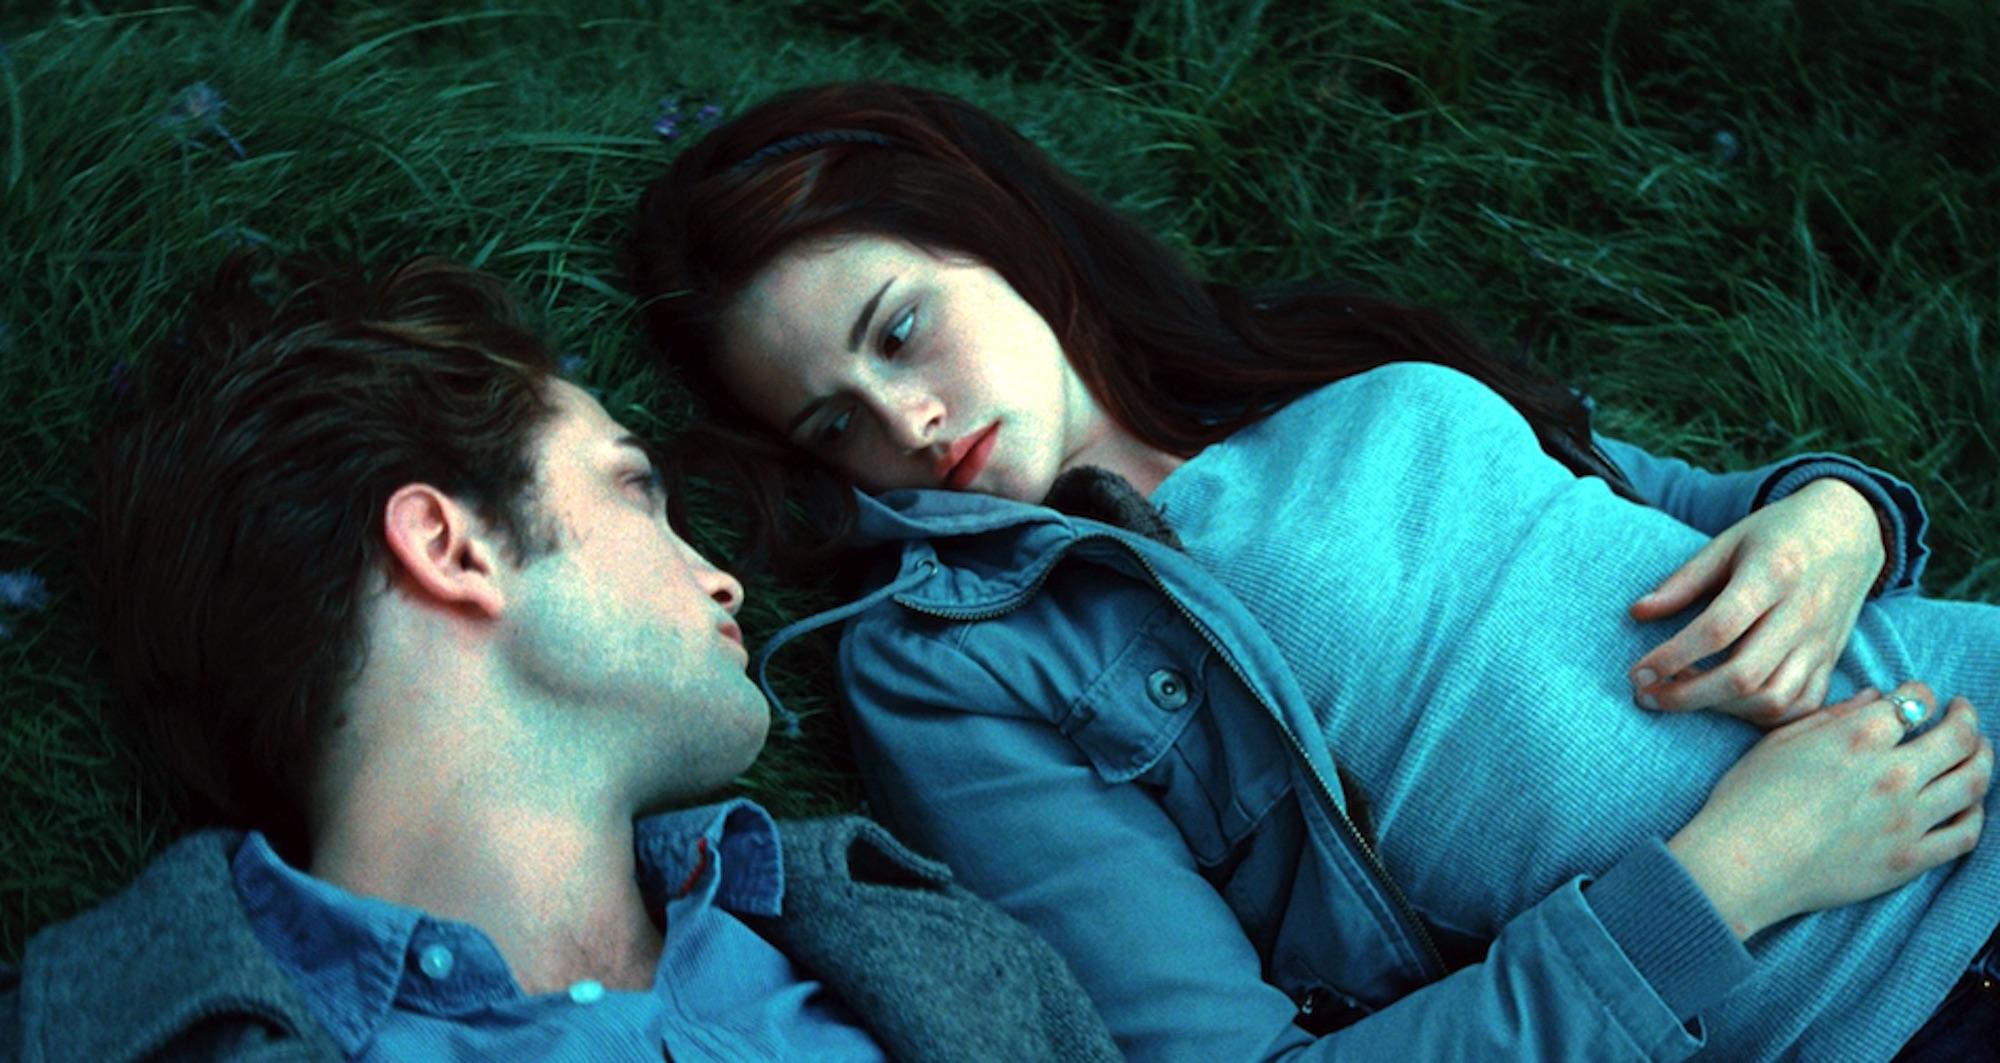 The First 'Twilight' Script Had FBI Vampire Hunters and a Track-Star Bella  Swan